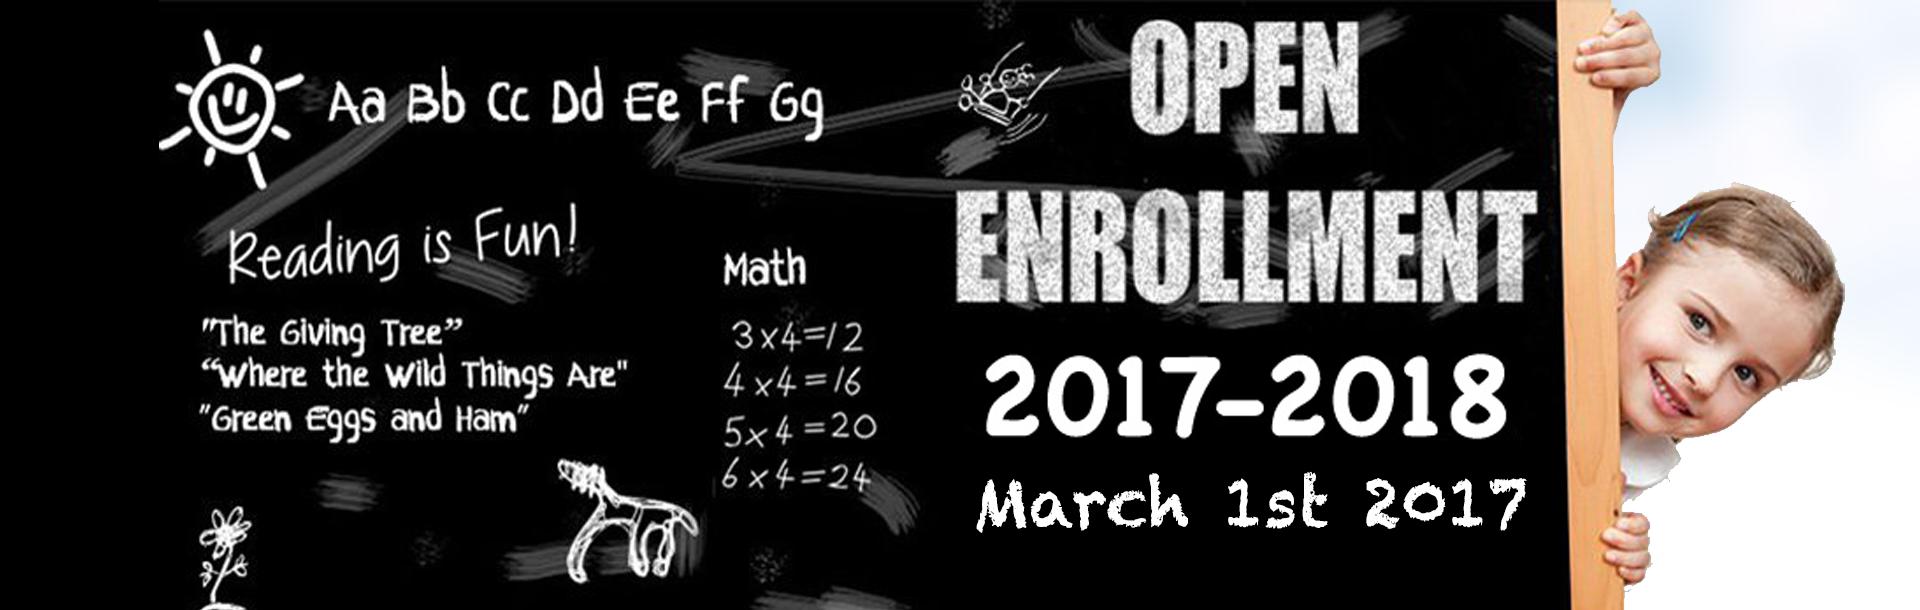 STARS-Open-Enrollment